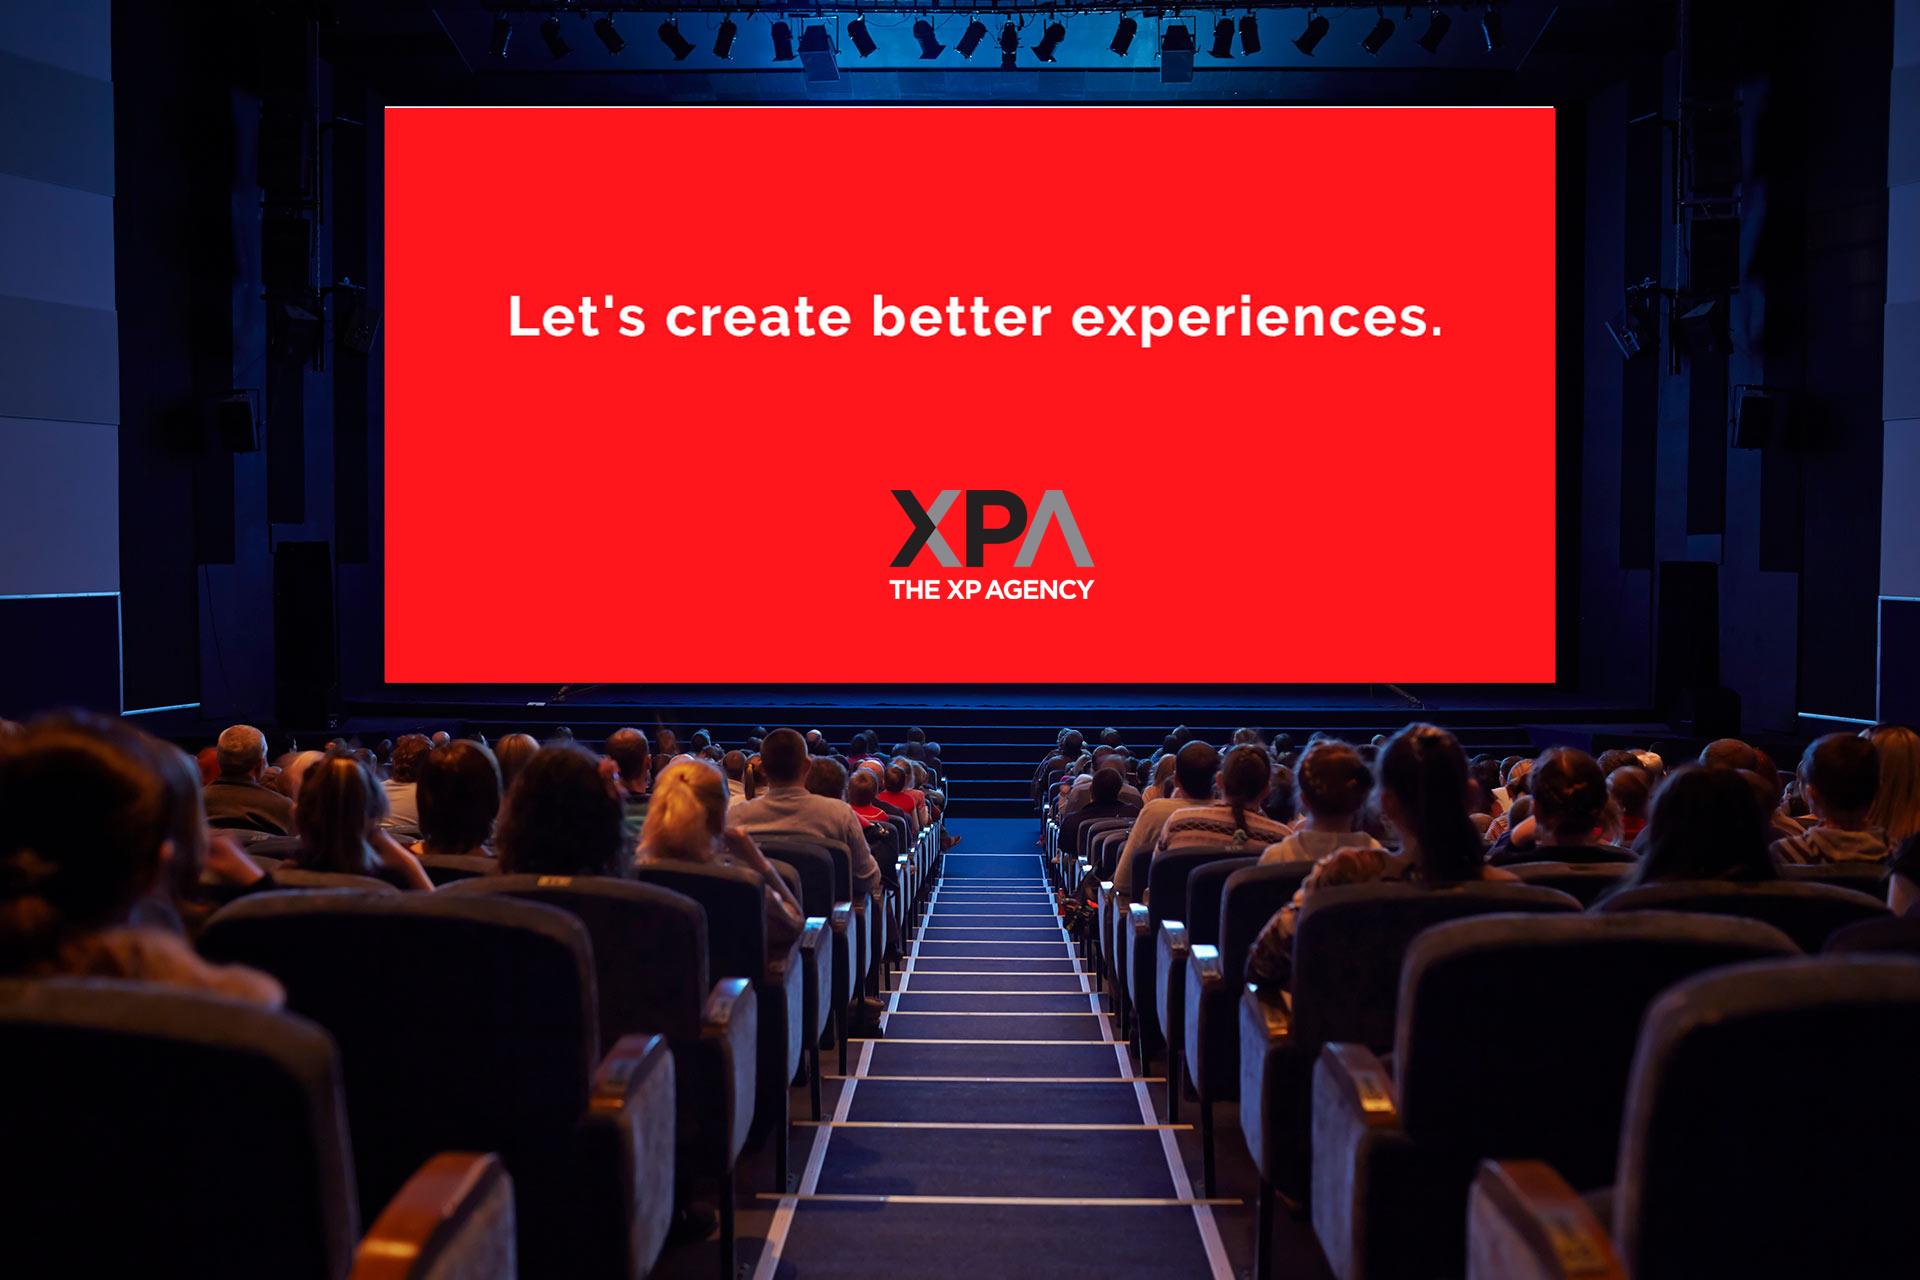 XPA Big Screen.jpg